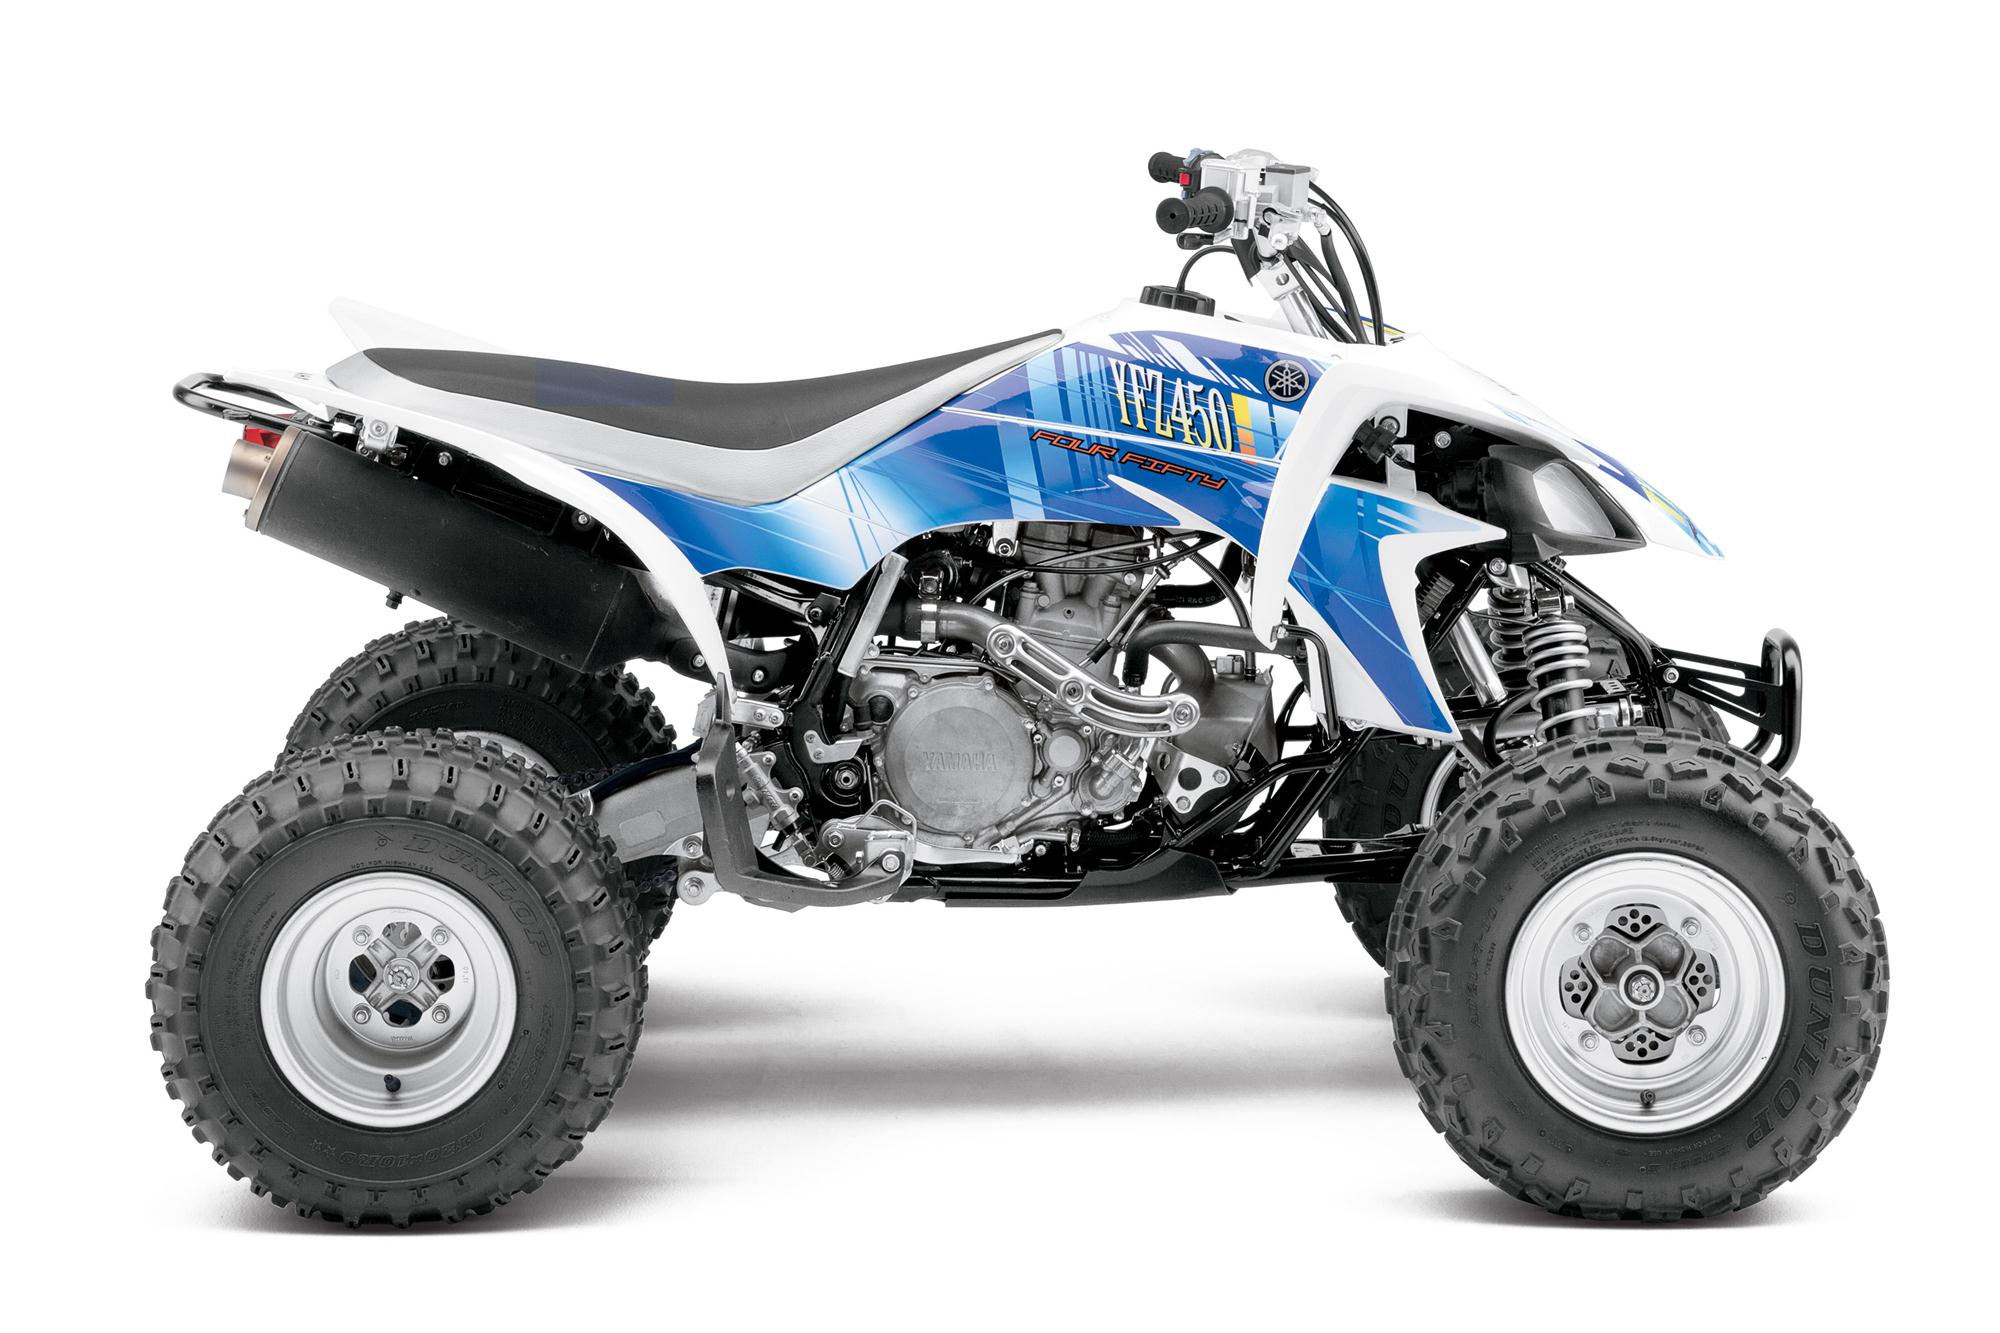 Yamaha Yfz450 The Atv Motocross Standard